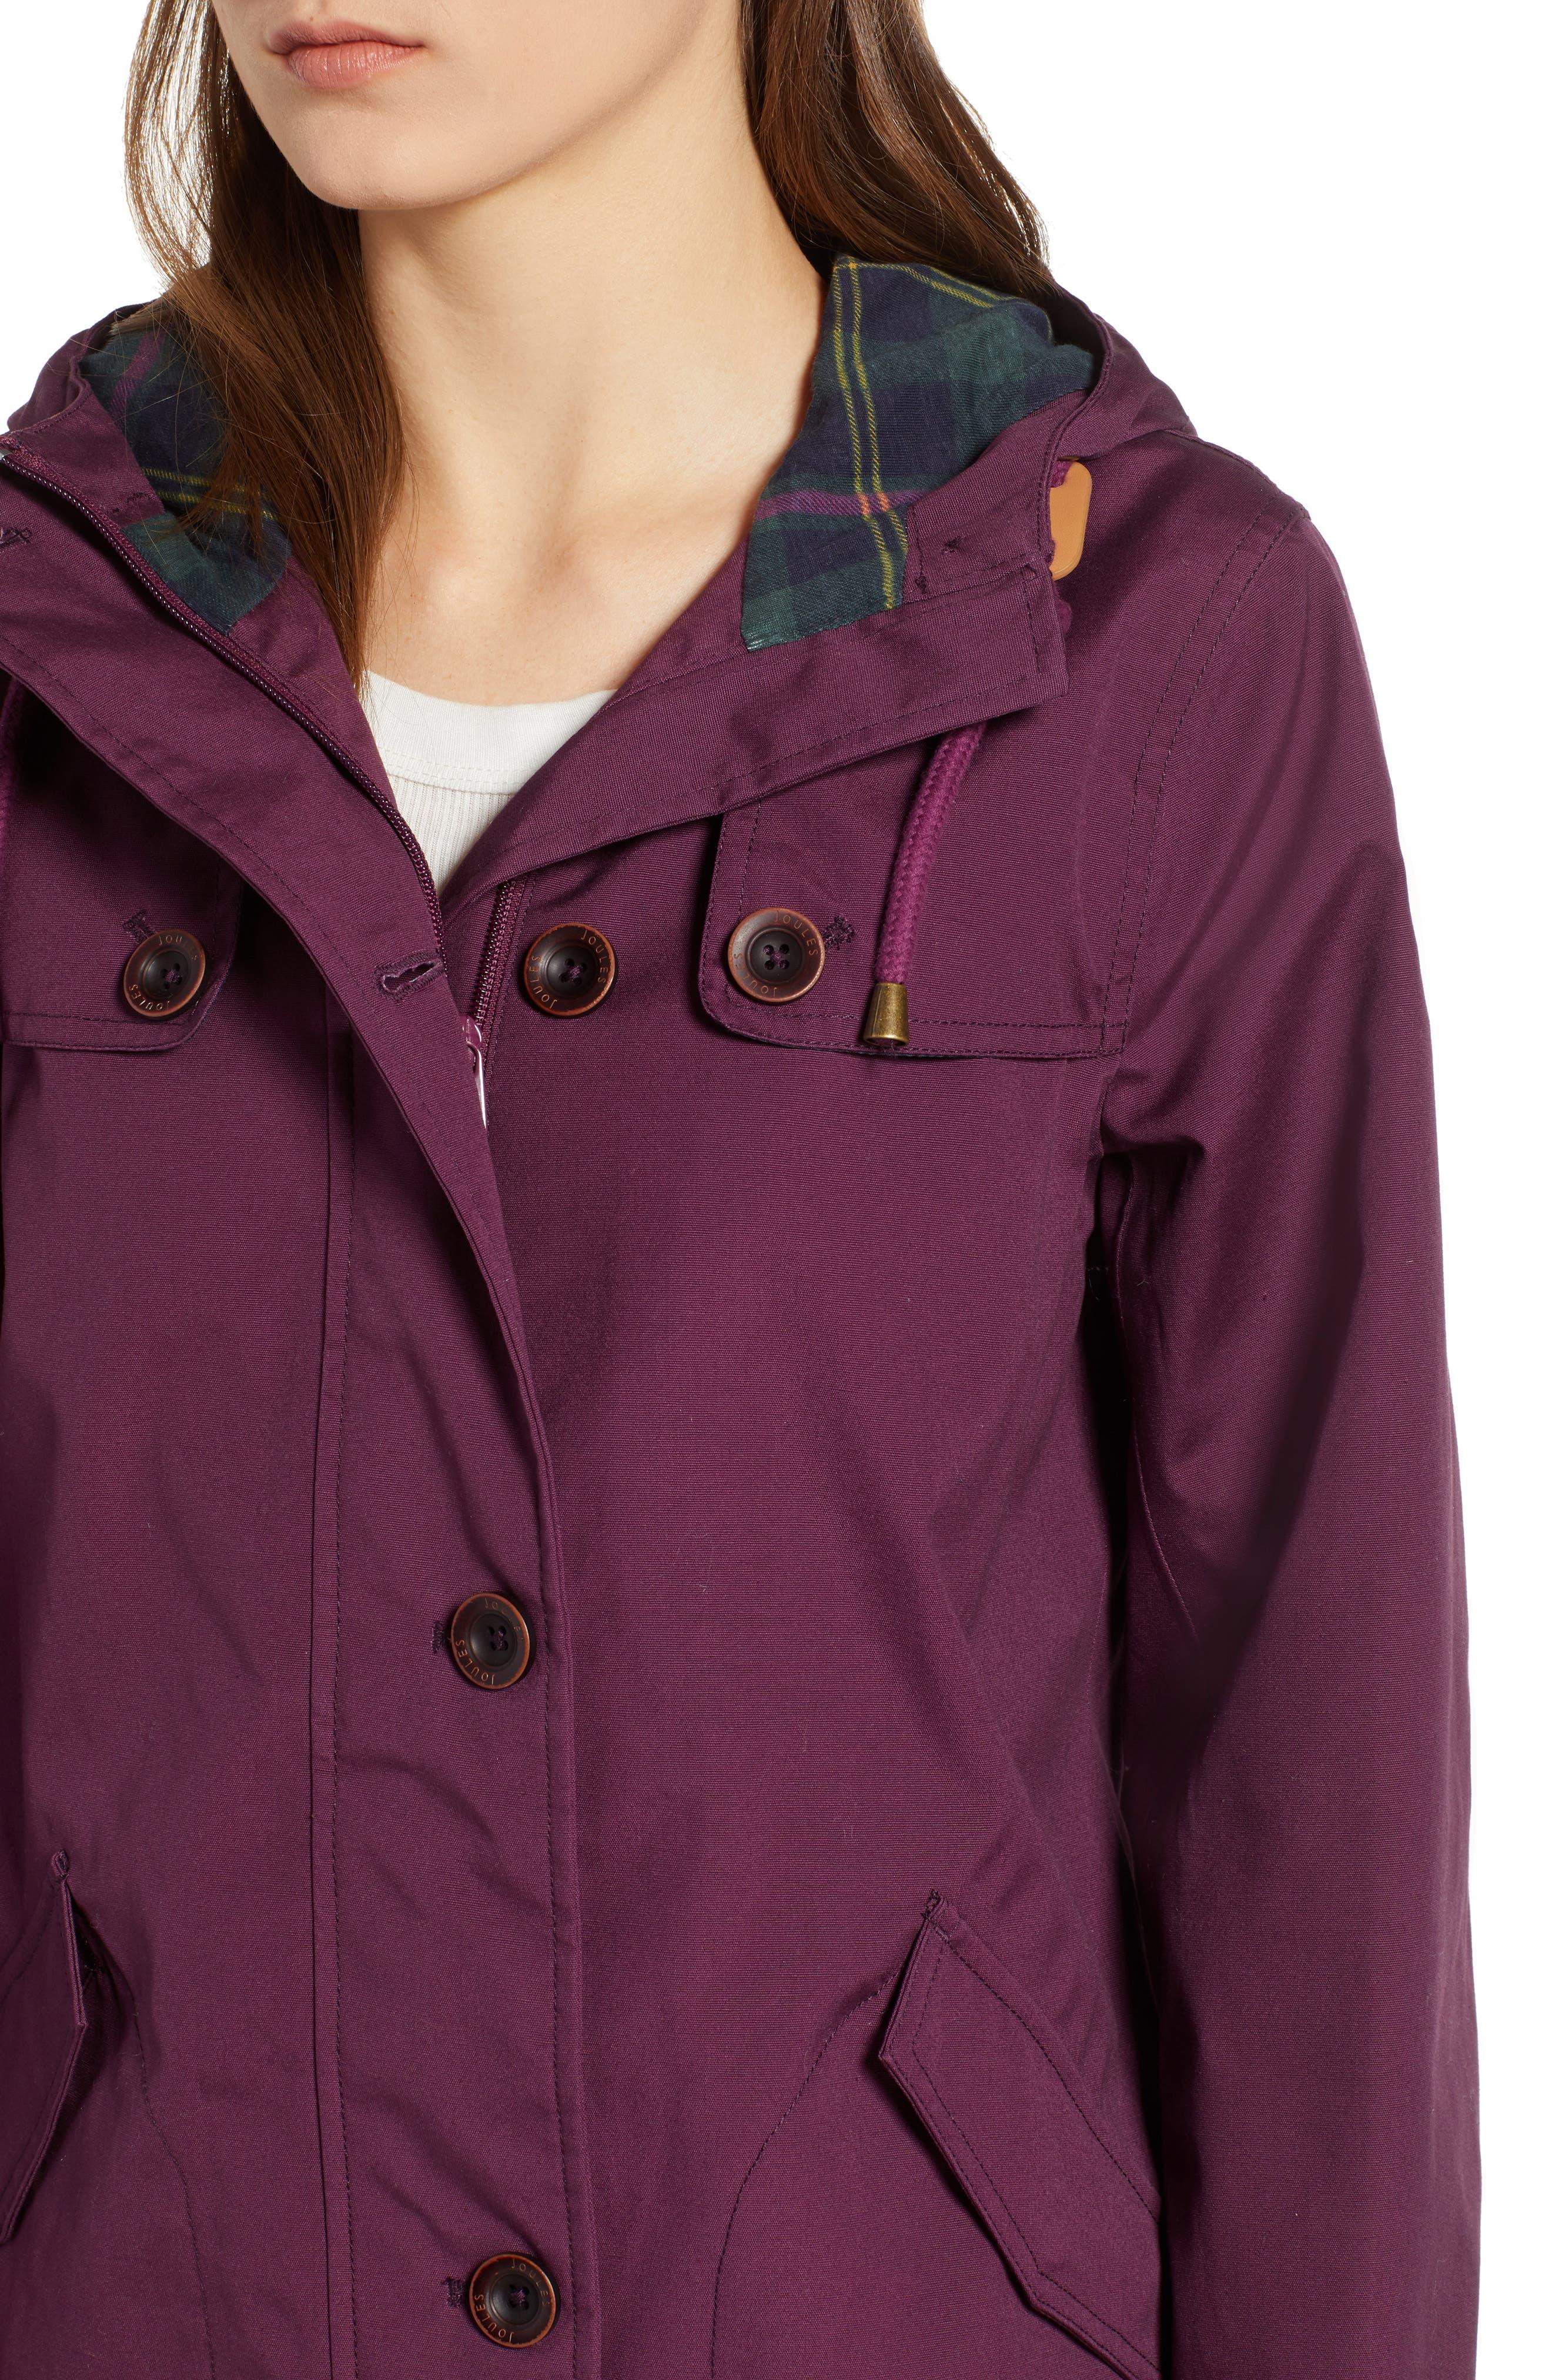 JOULES,                             Right as Rain Waterproof Hooded Jacket,                             Alternate thumbnail 4, color,                             930